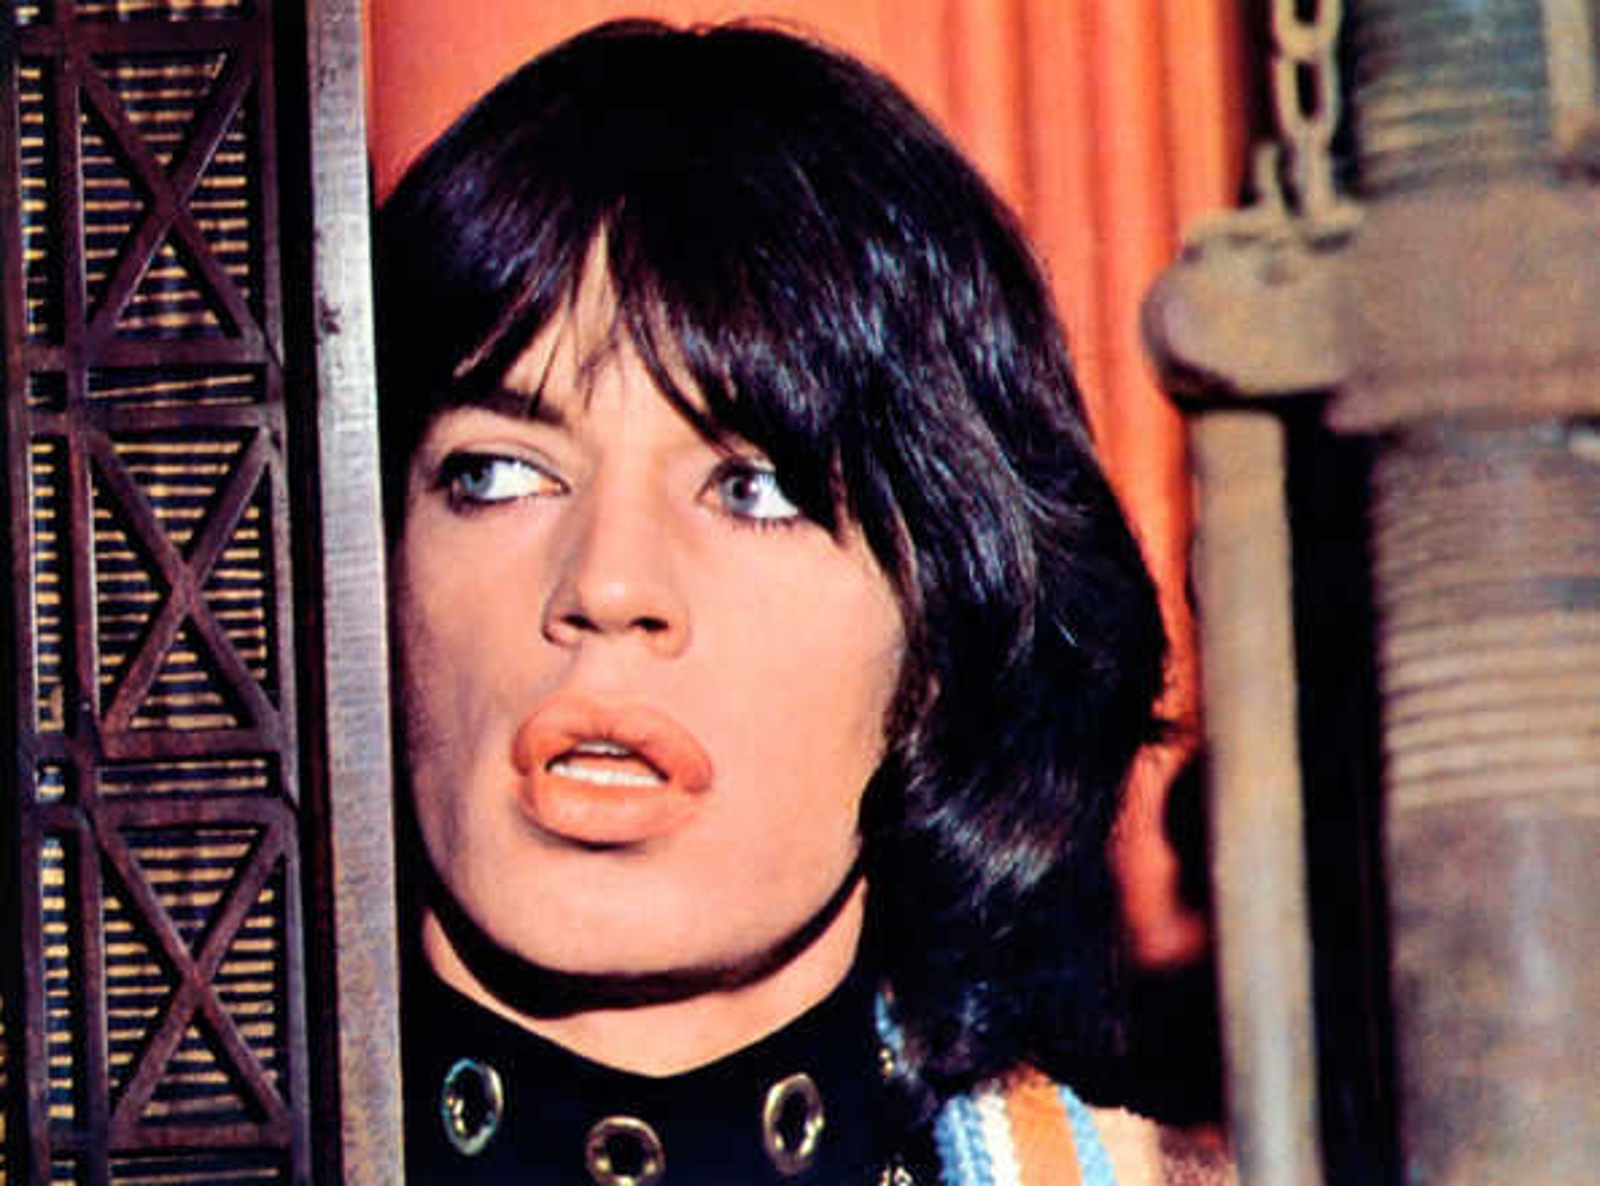 Turner (Mick Jagger) - Nicolas Roeg & Donald Cammell